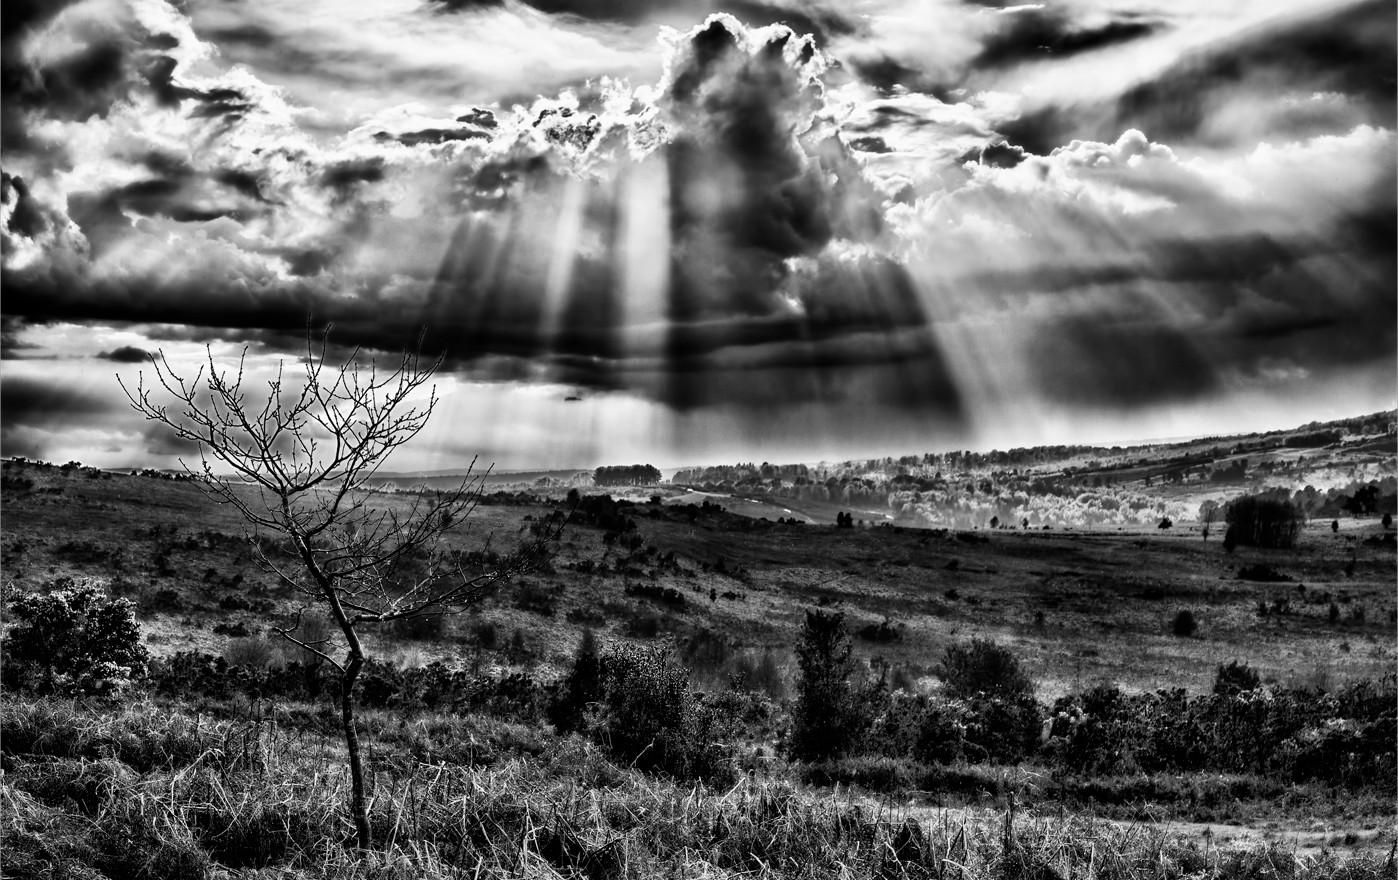 THE SUN BURSTS THROUGH by Nick Ryan